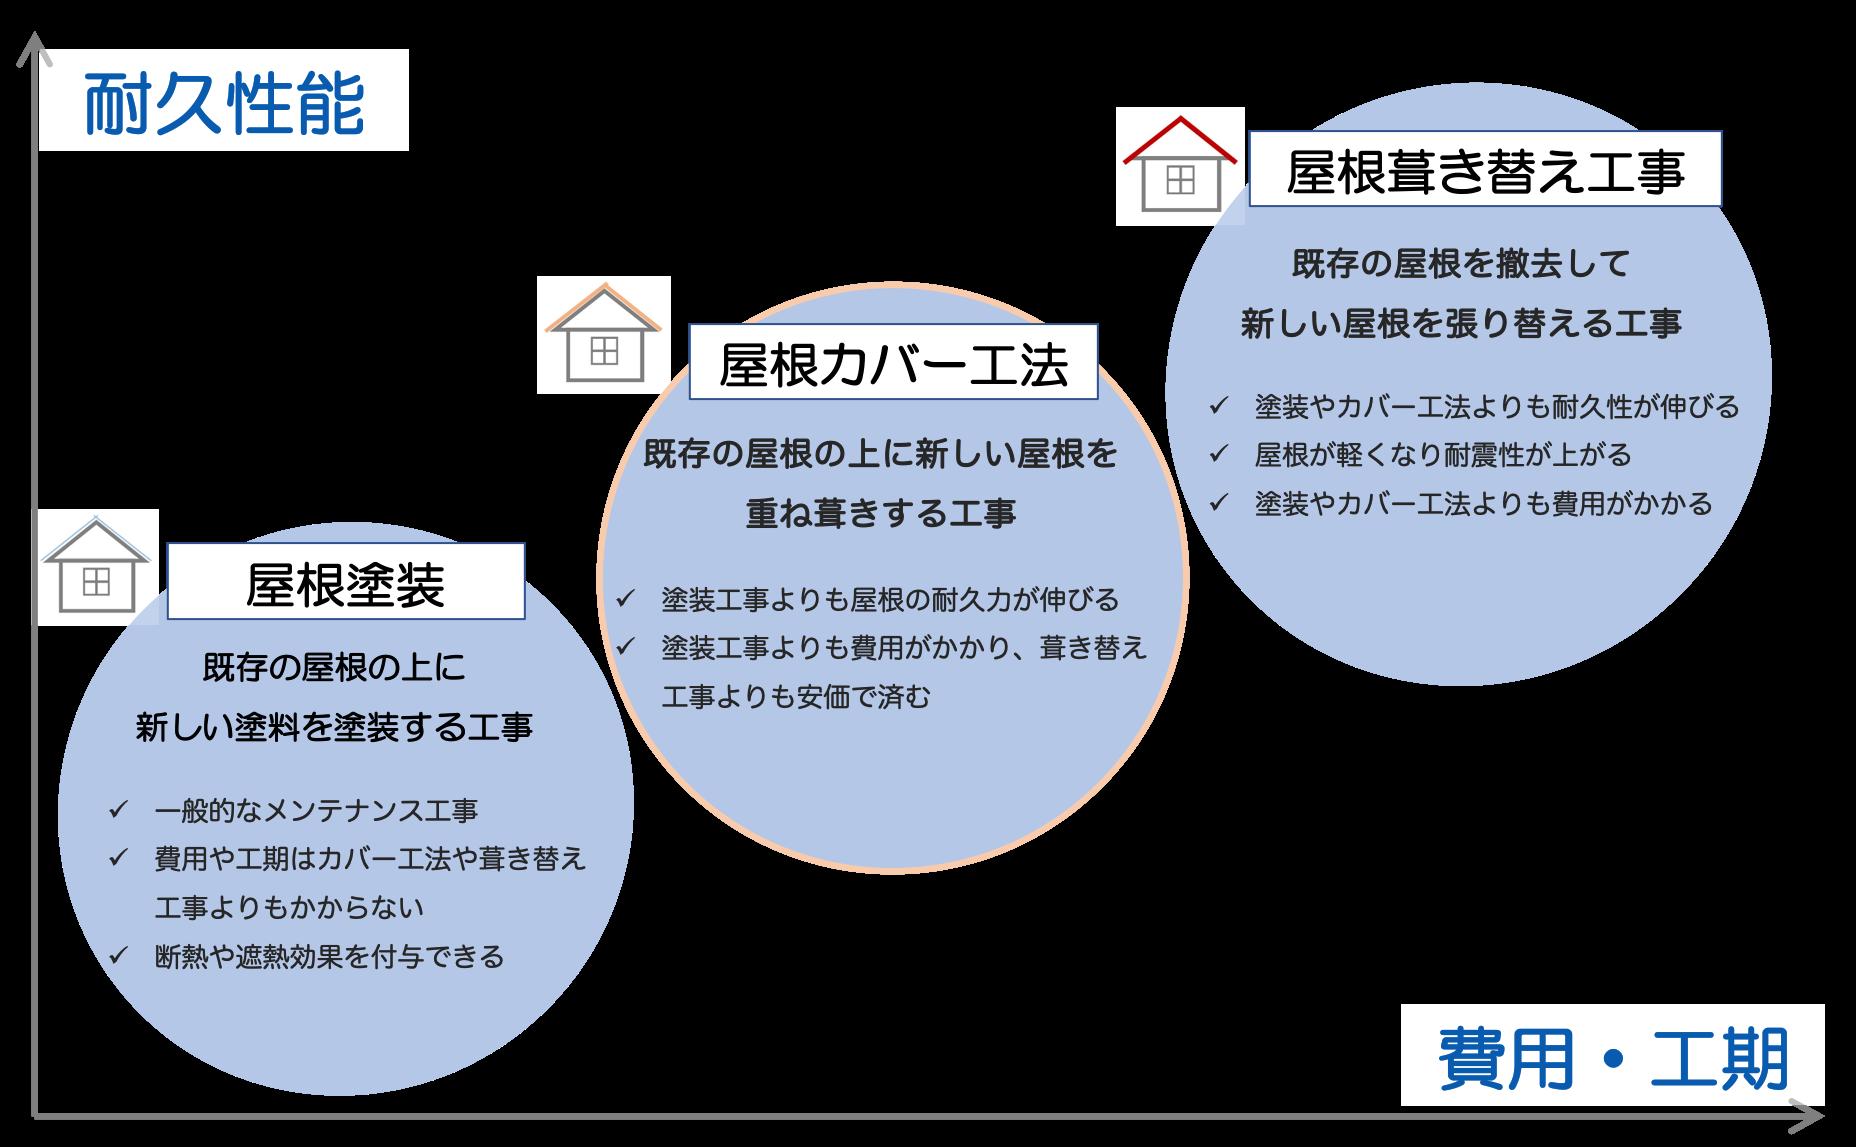 各種屋根工事の比較。屋根カバー工法